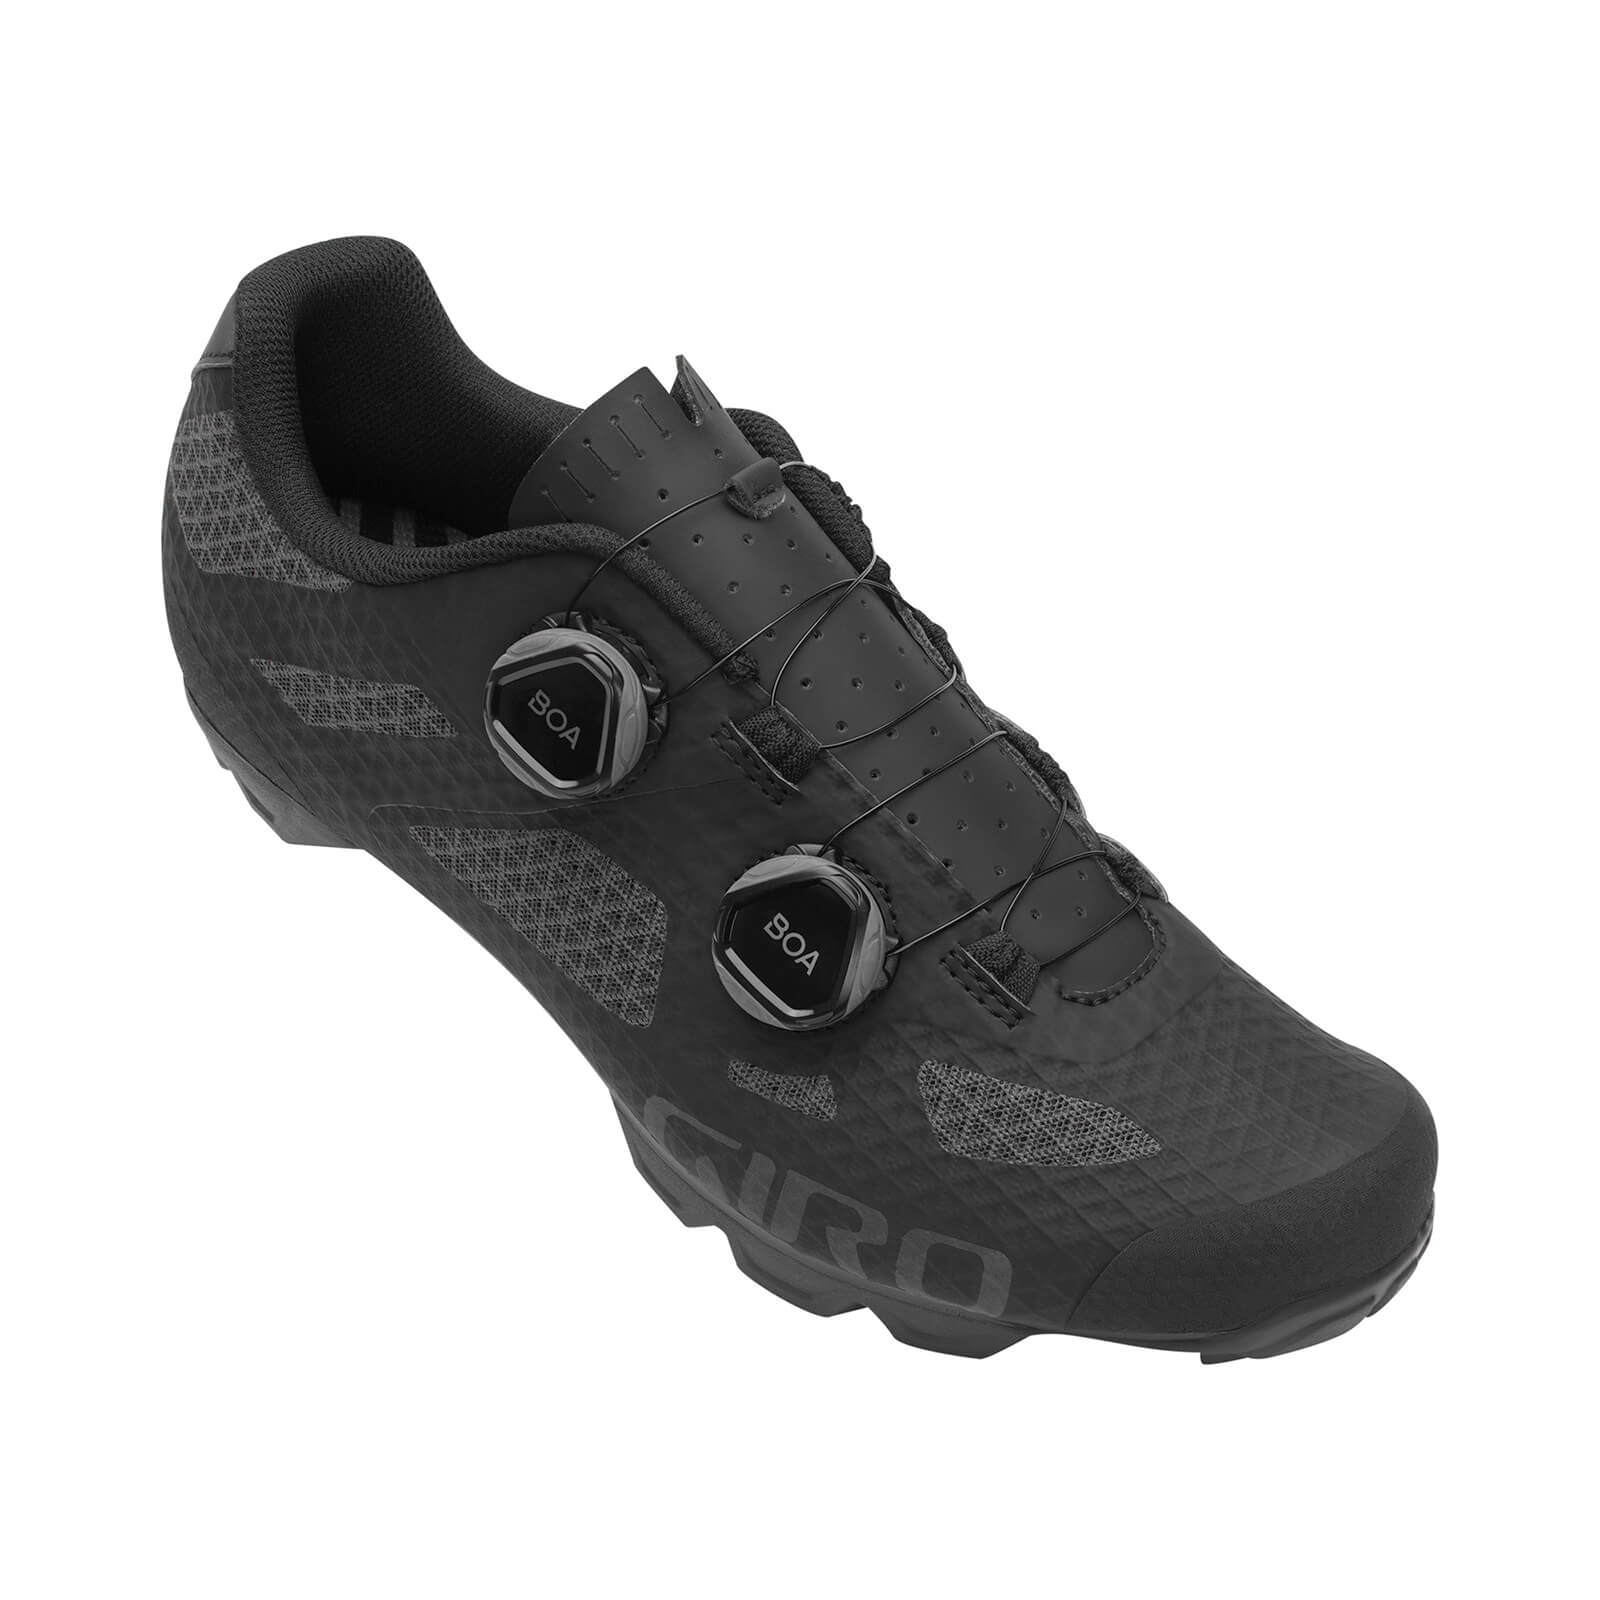 Giro Sector MTB Shoe - EU 47 - Black/Dark Shadow